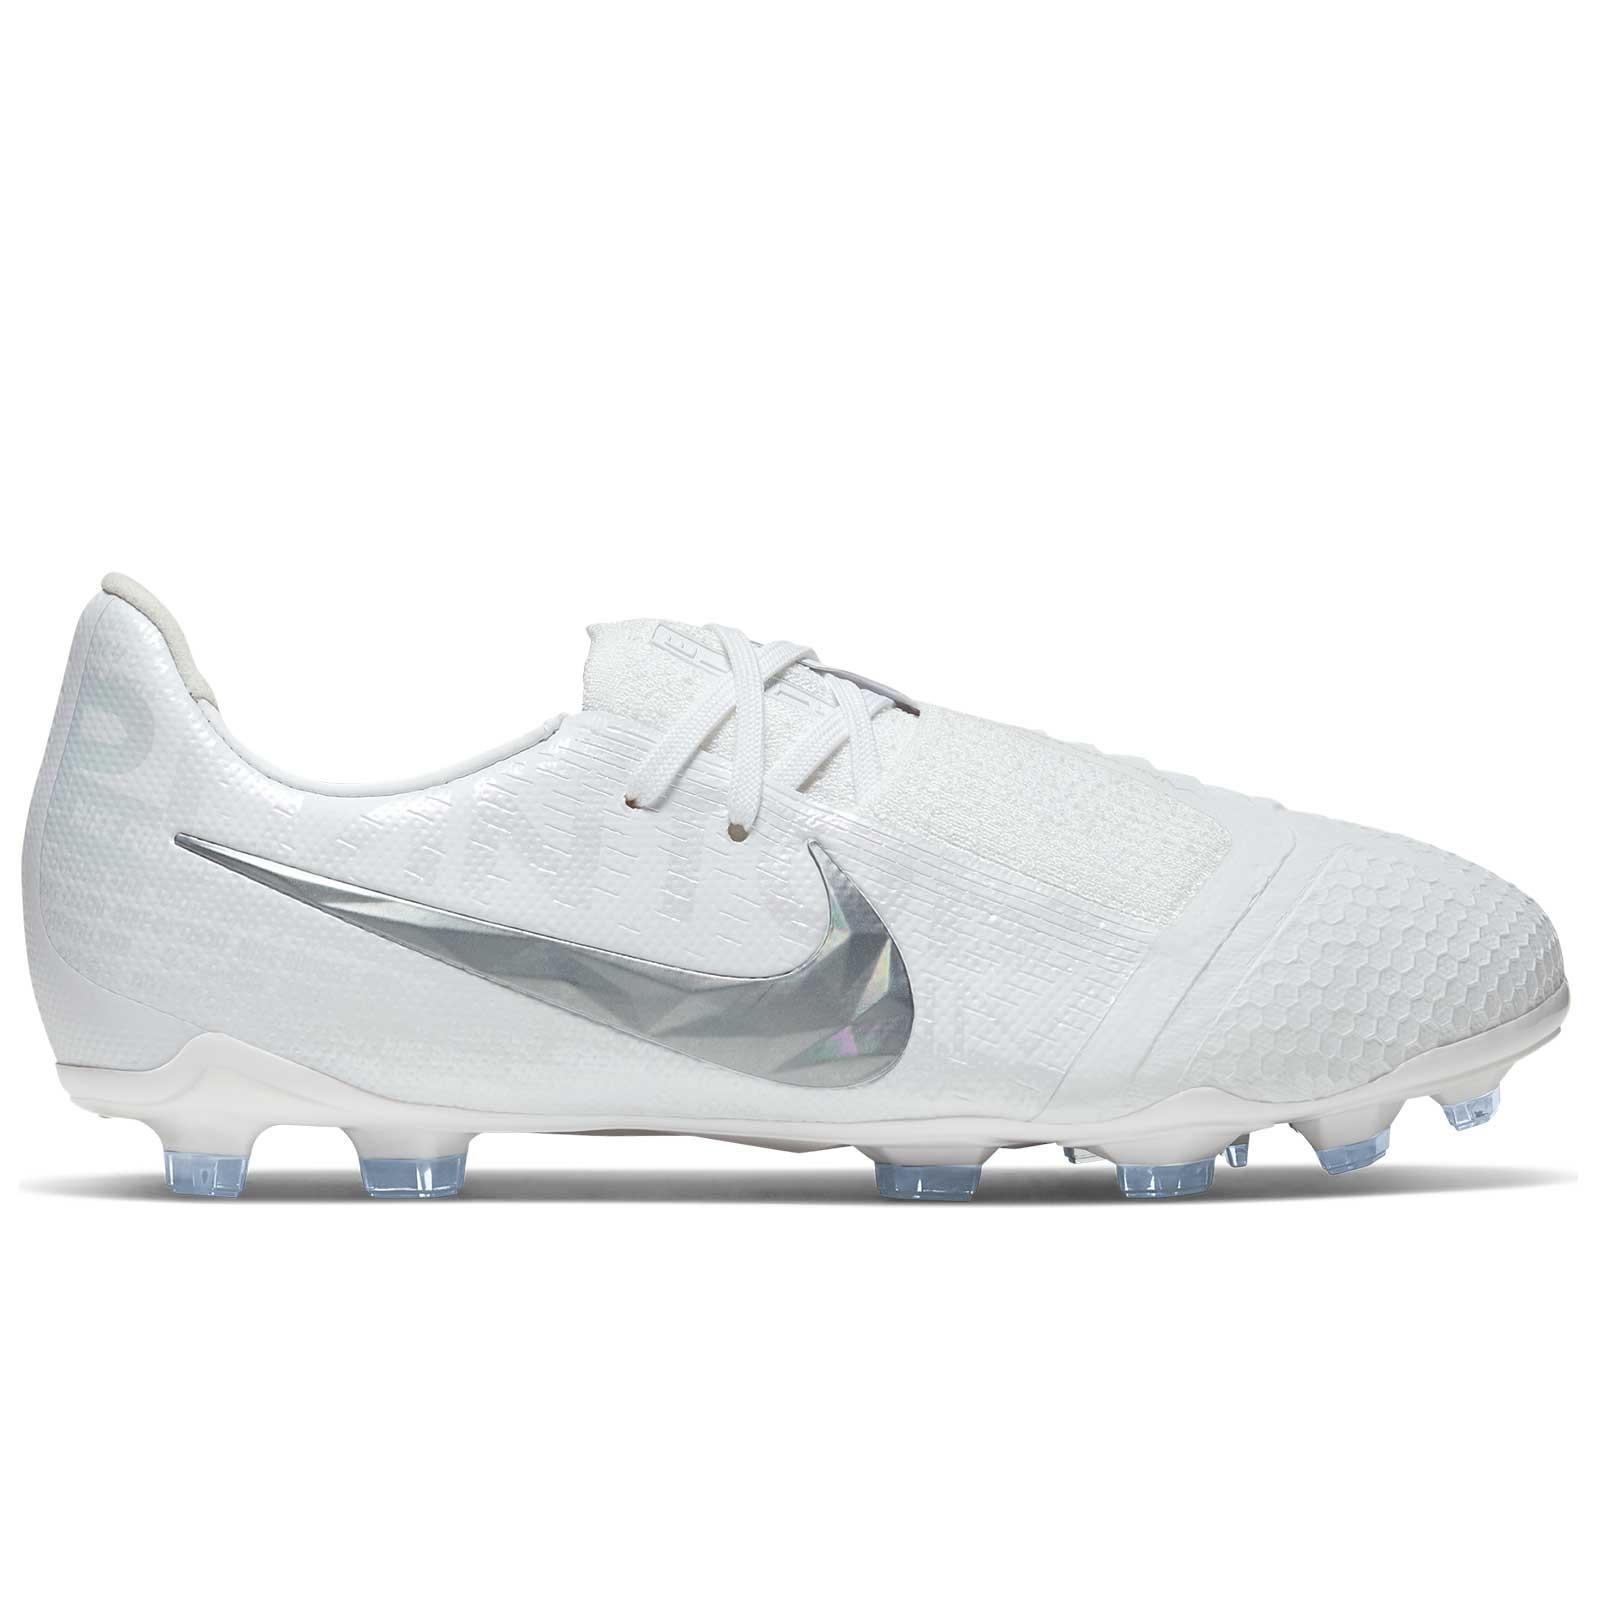 C1727 scarpa calcio uomo NIKE MERCURIAL VICTORY AG football soccer shoe man